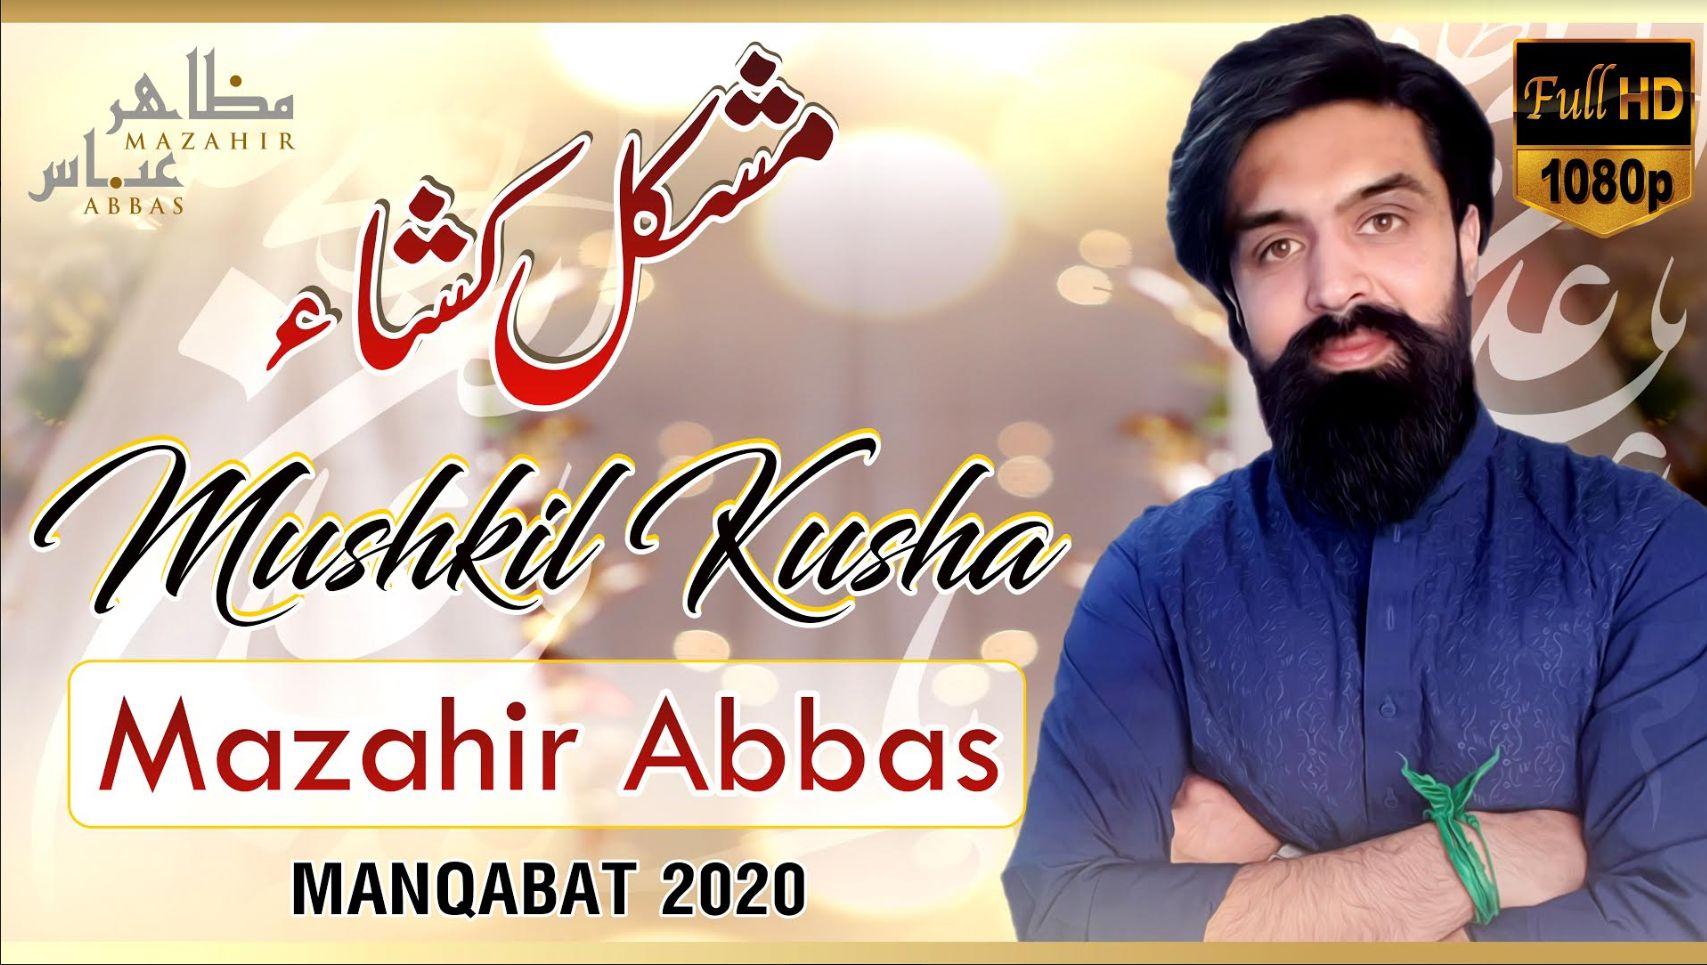 Tu Sab Ka Mushkil Kusha | Mazahir Abbas New Manqabat 2020 | Moula Imam Ali A.S Manqabat 2020